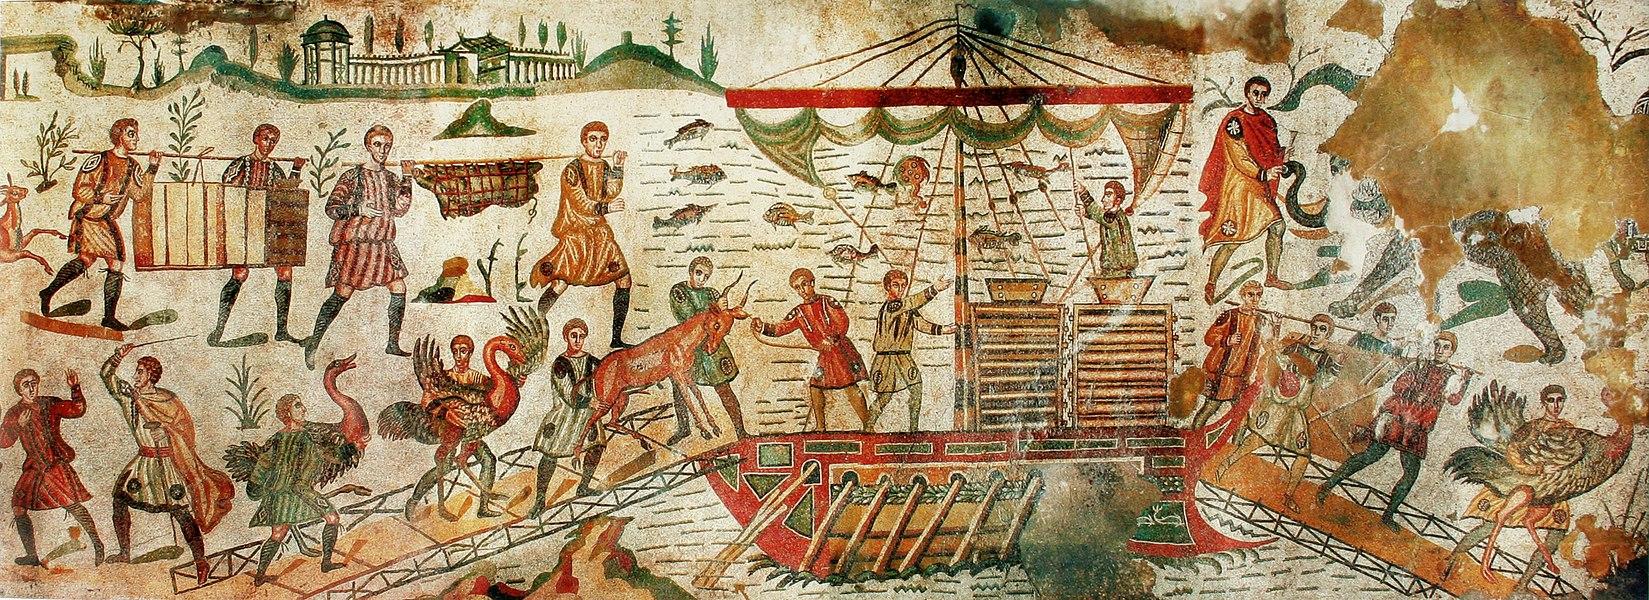 roman mosaic - image 6